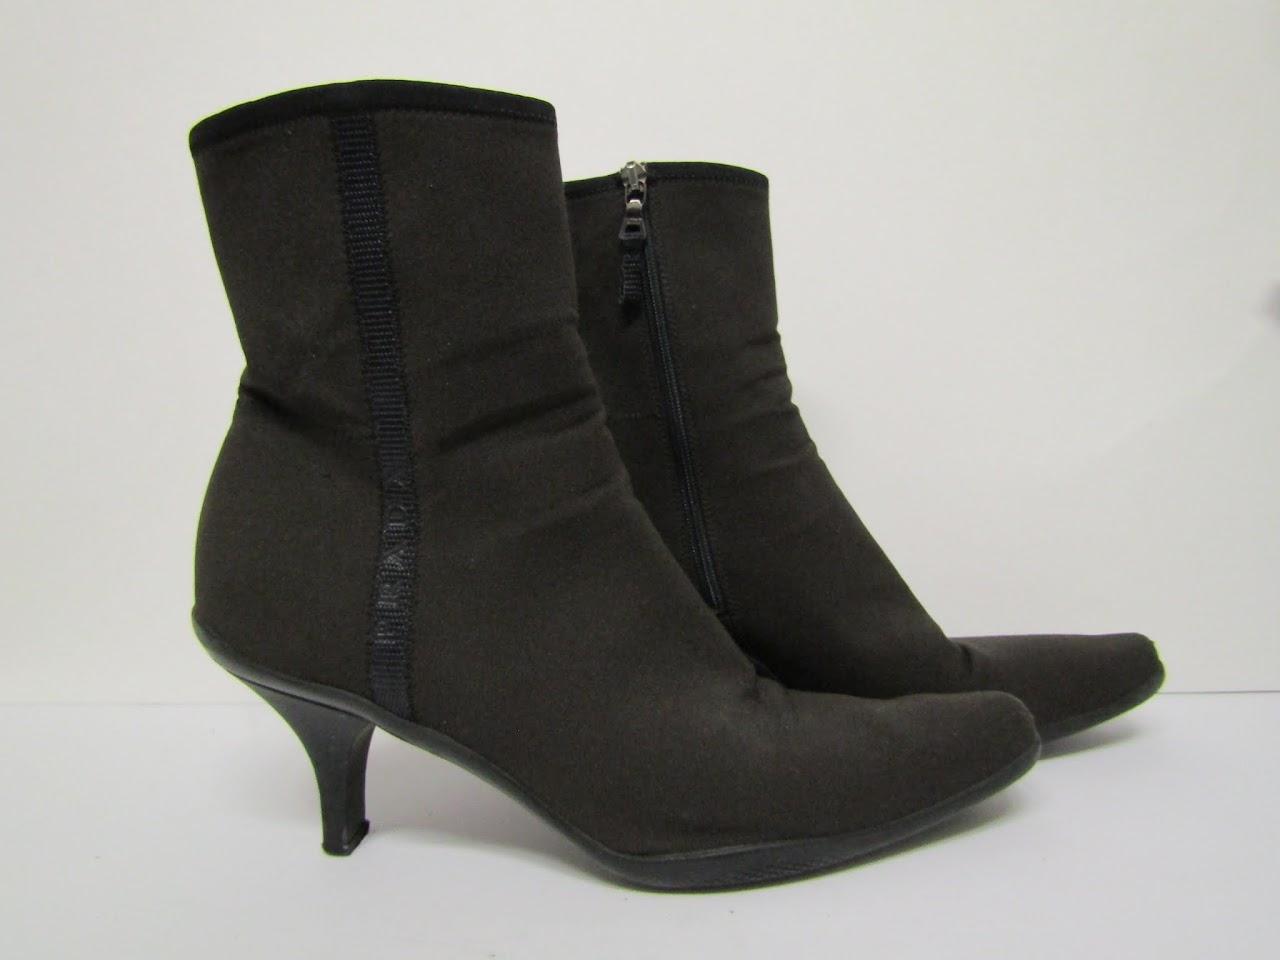 Prada Sport Neopreen Boots